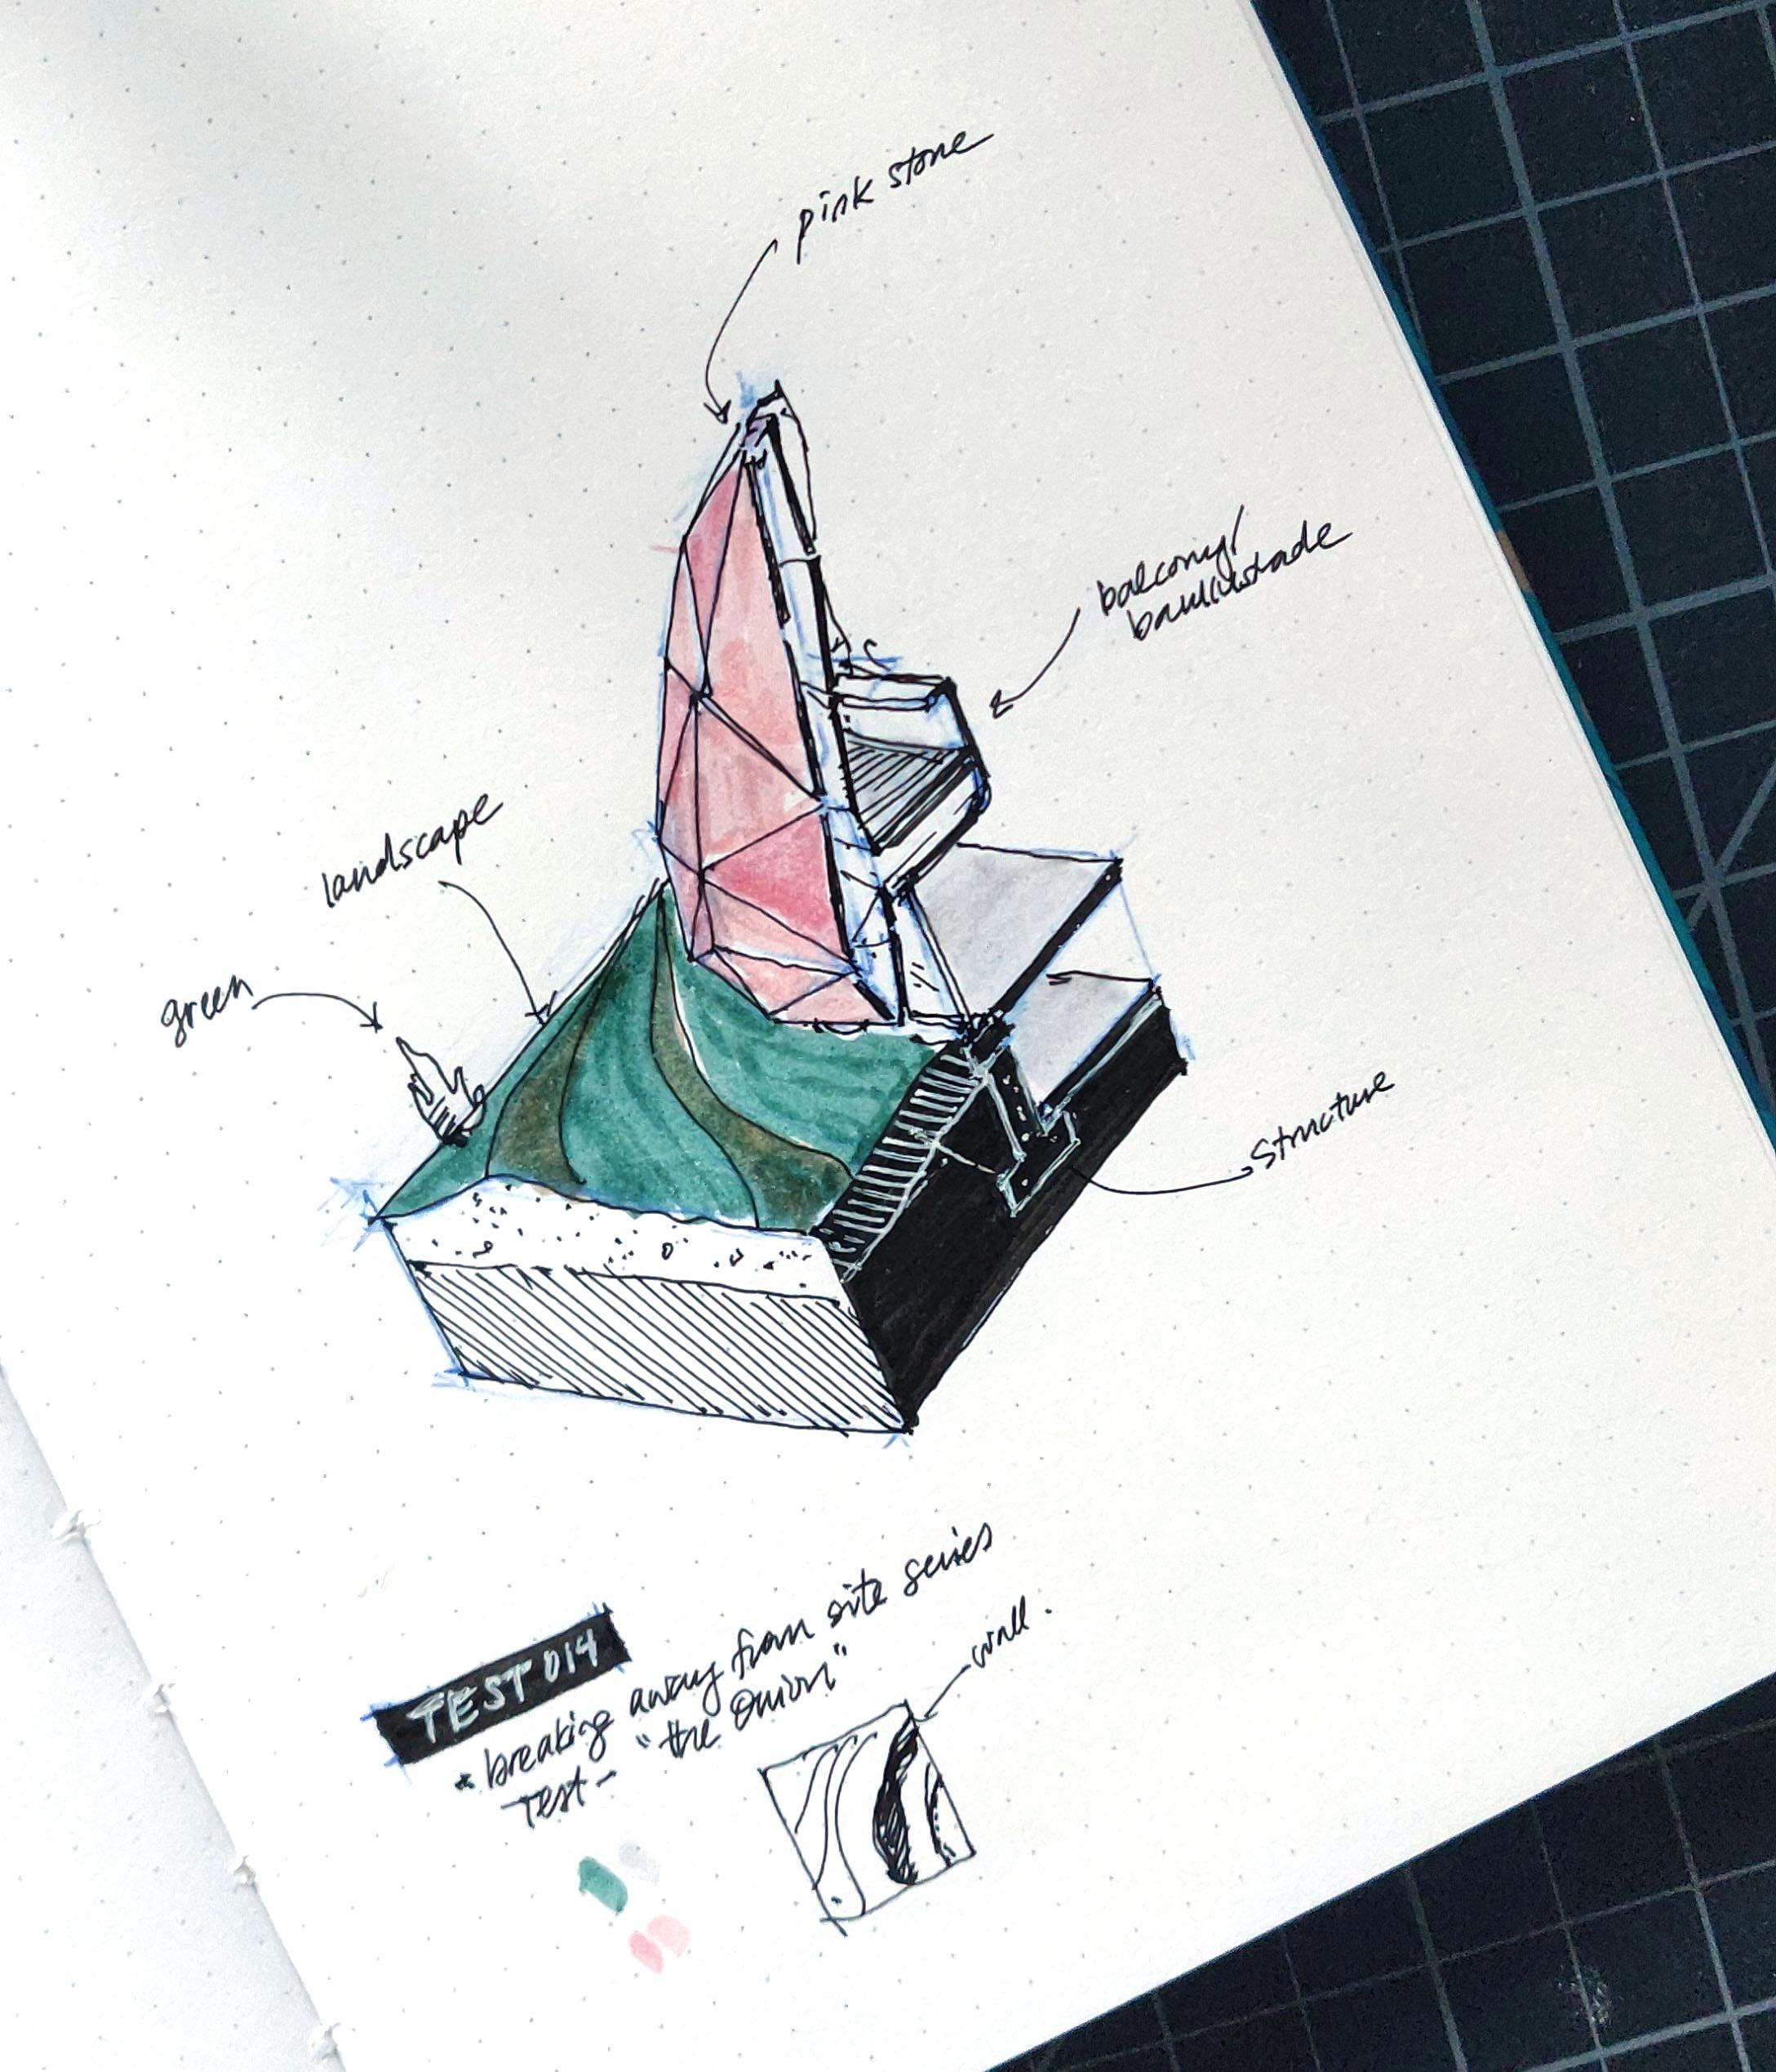 test 014 sketch